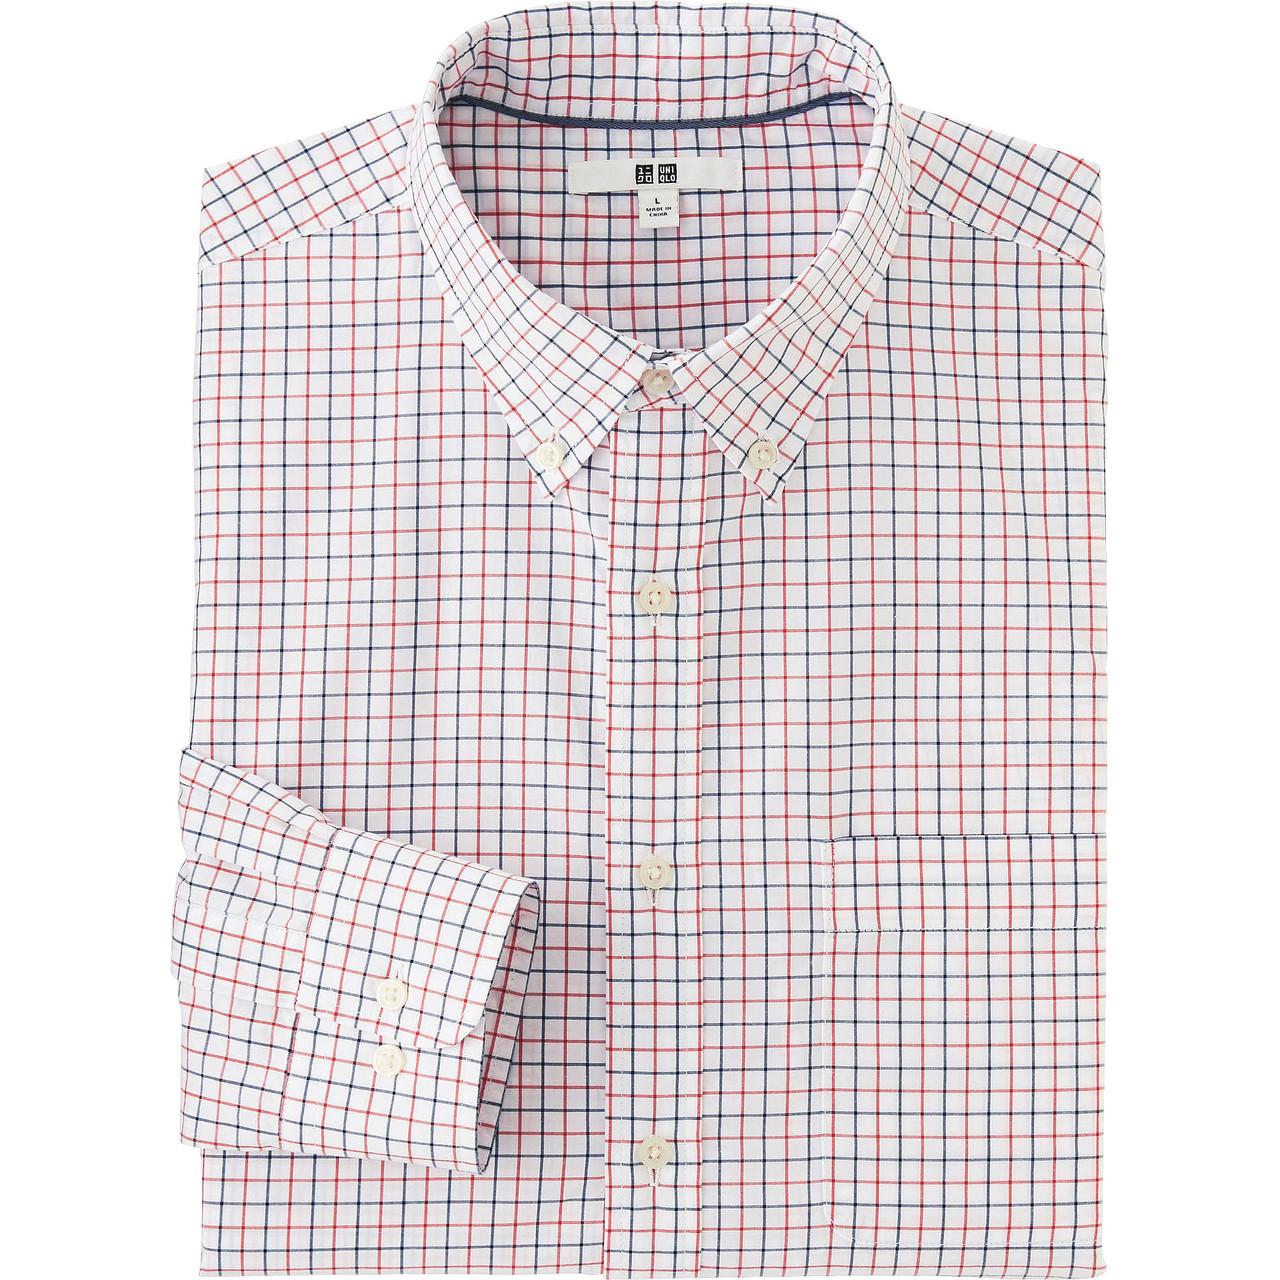 Рубашка Uniqlo Men Extra Fine Cotton Broadcloth Check LS RED